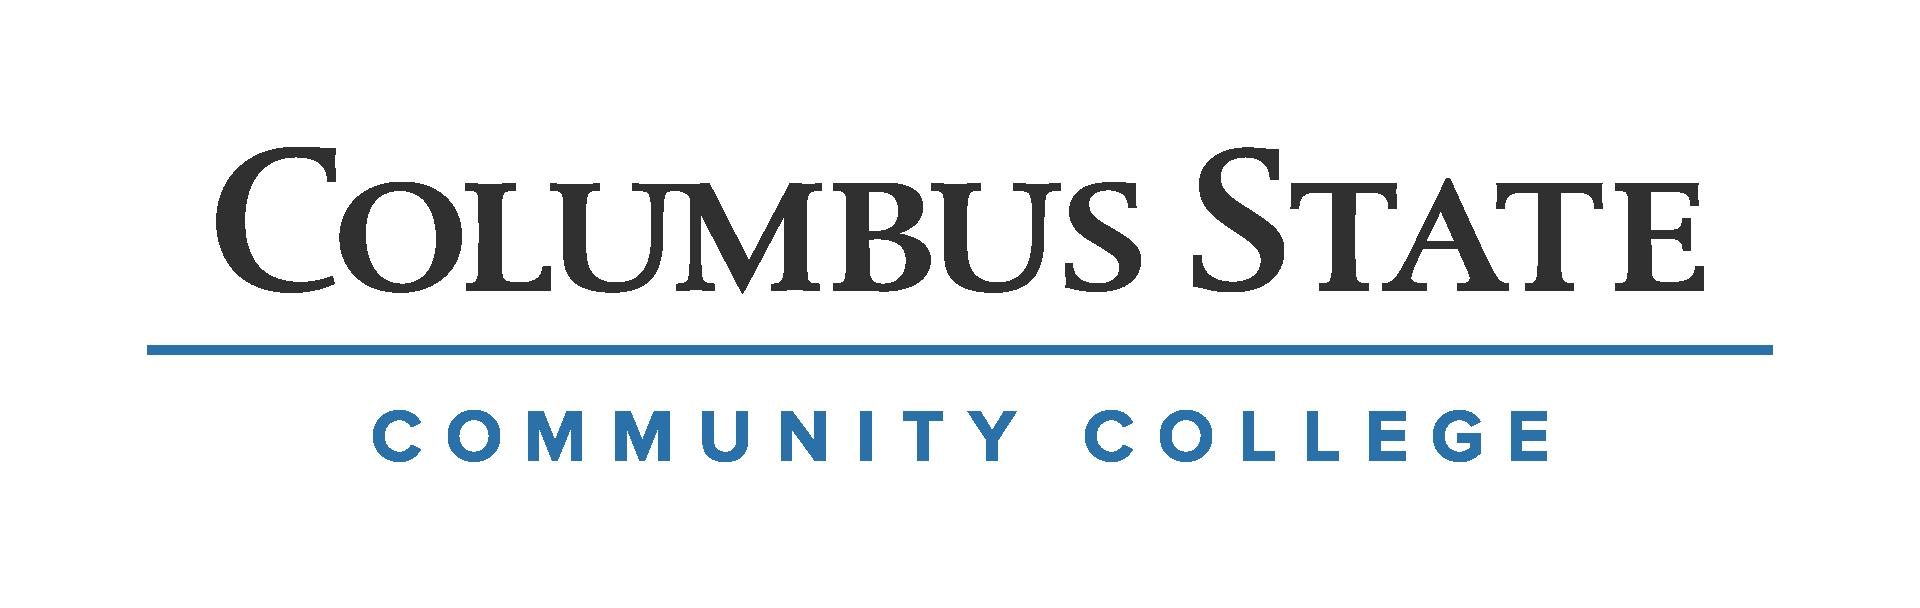 client-logos-Columbus state